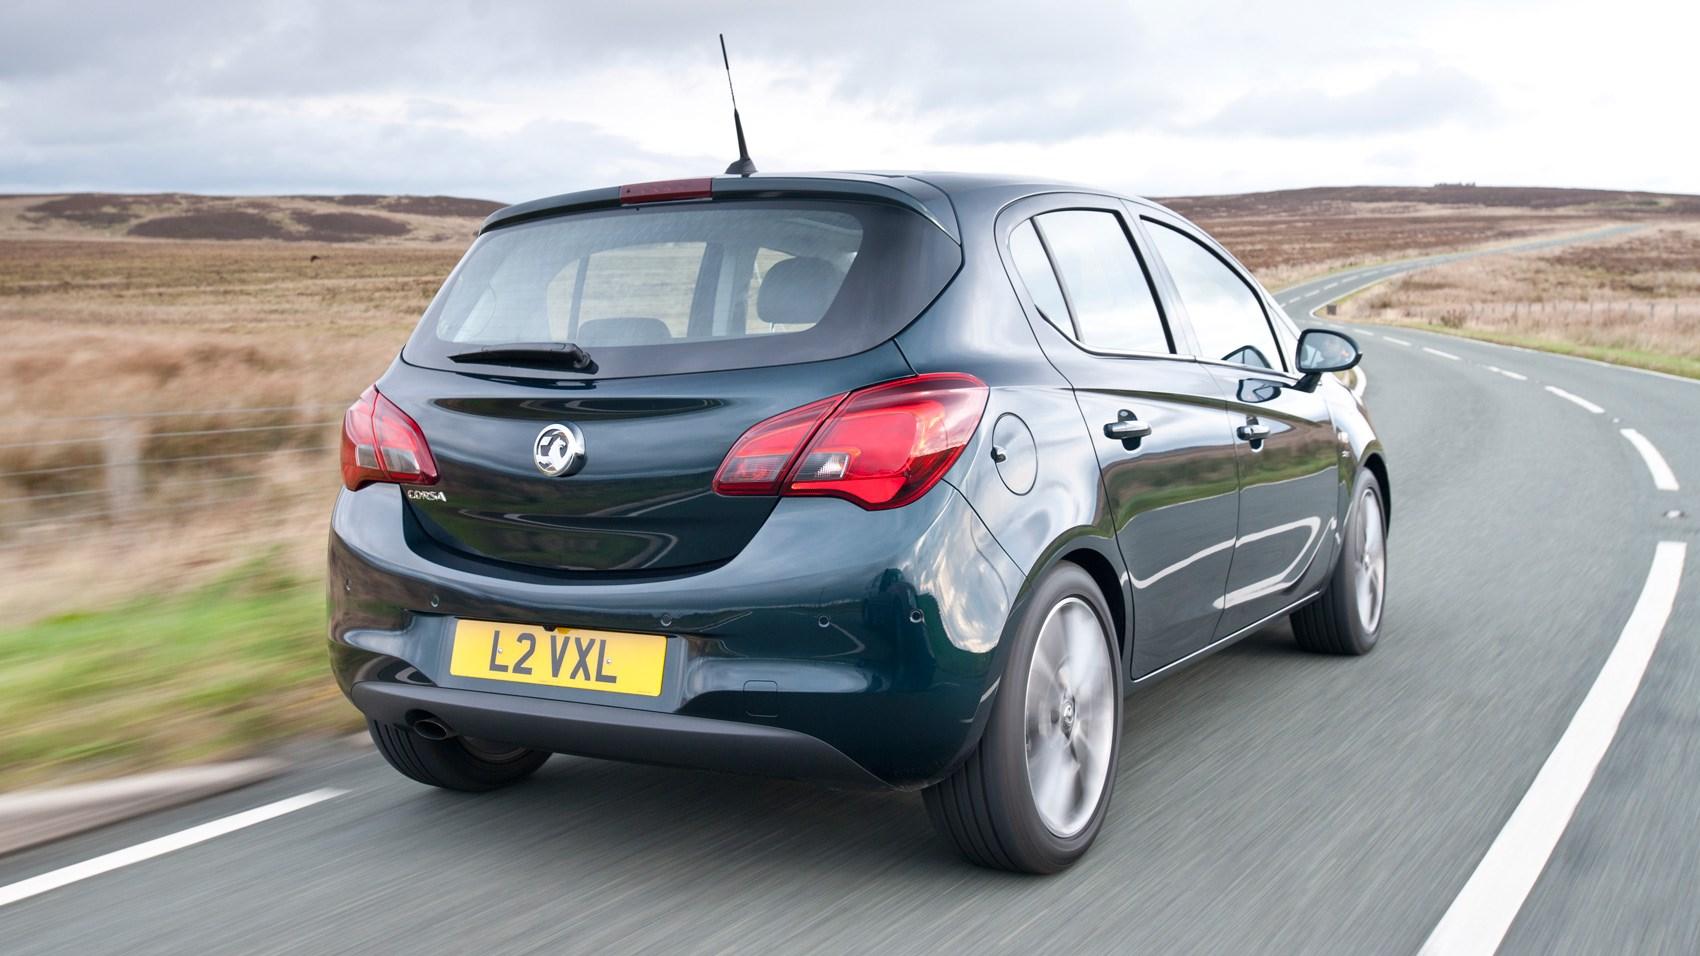 Vauxhall Corsa diesel rear cornering